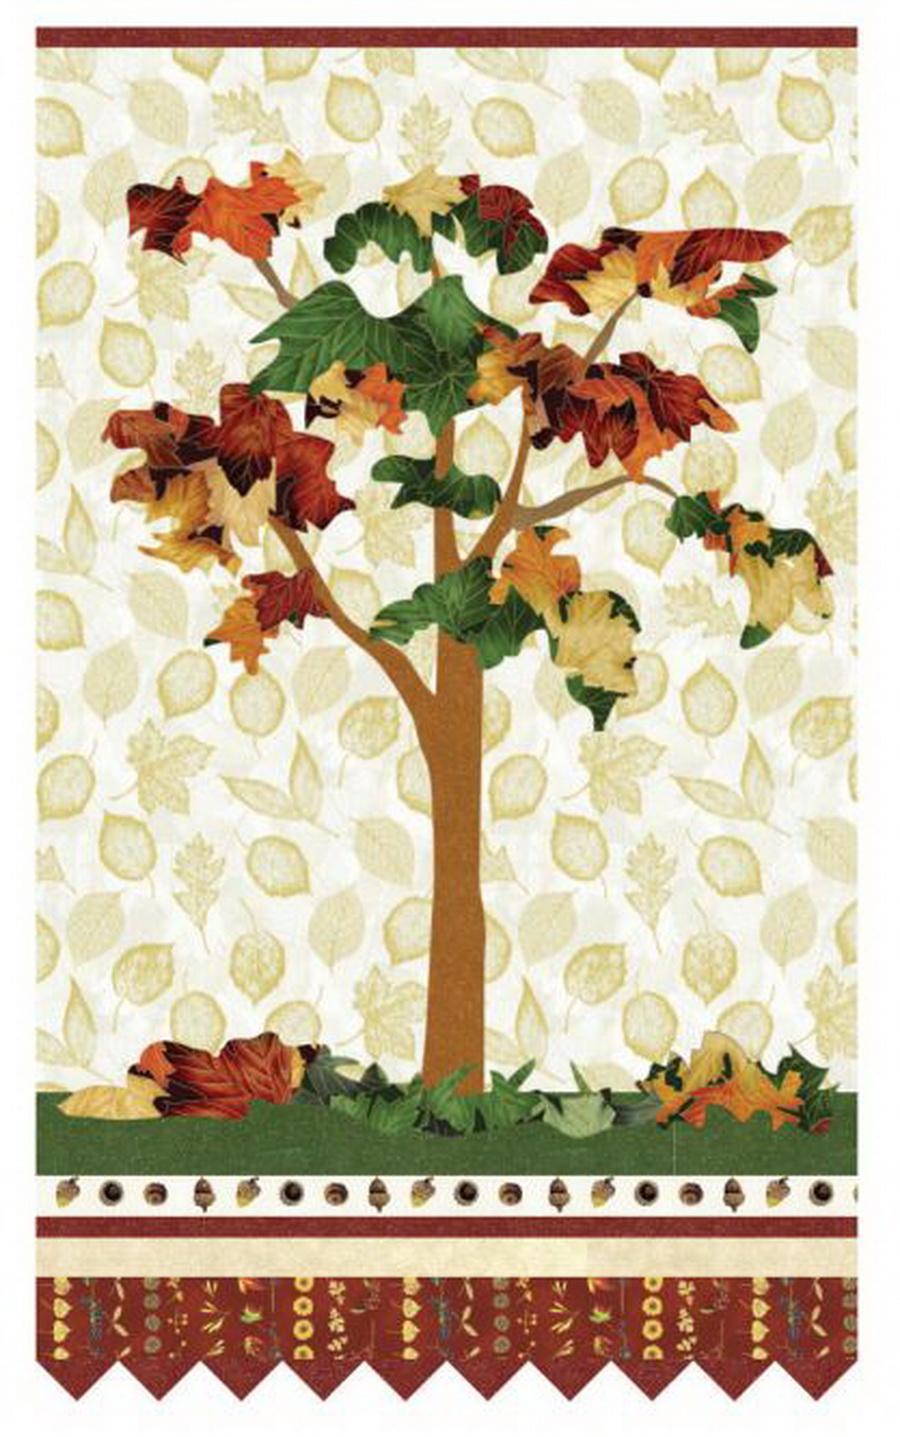 Hoffman Fabrics - Falling Leaves Quilting Fabric Kit